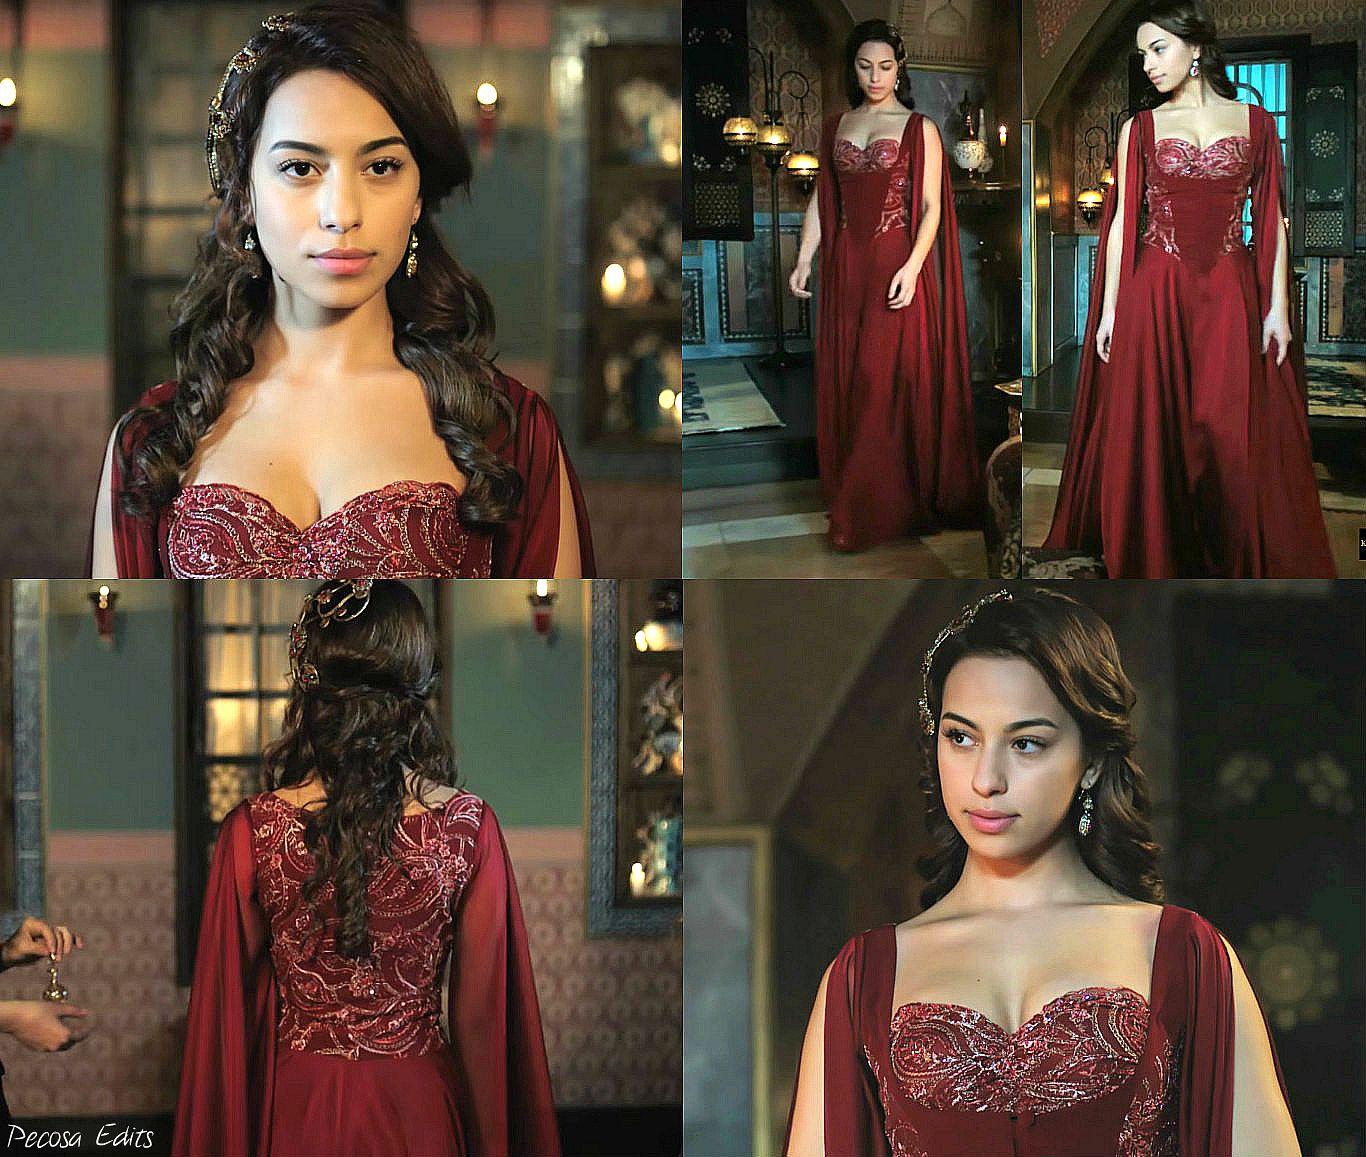 muhtesem yuzyil kosem, magnificent century kosem, yasemine hatun, crimson dress, red dress